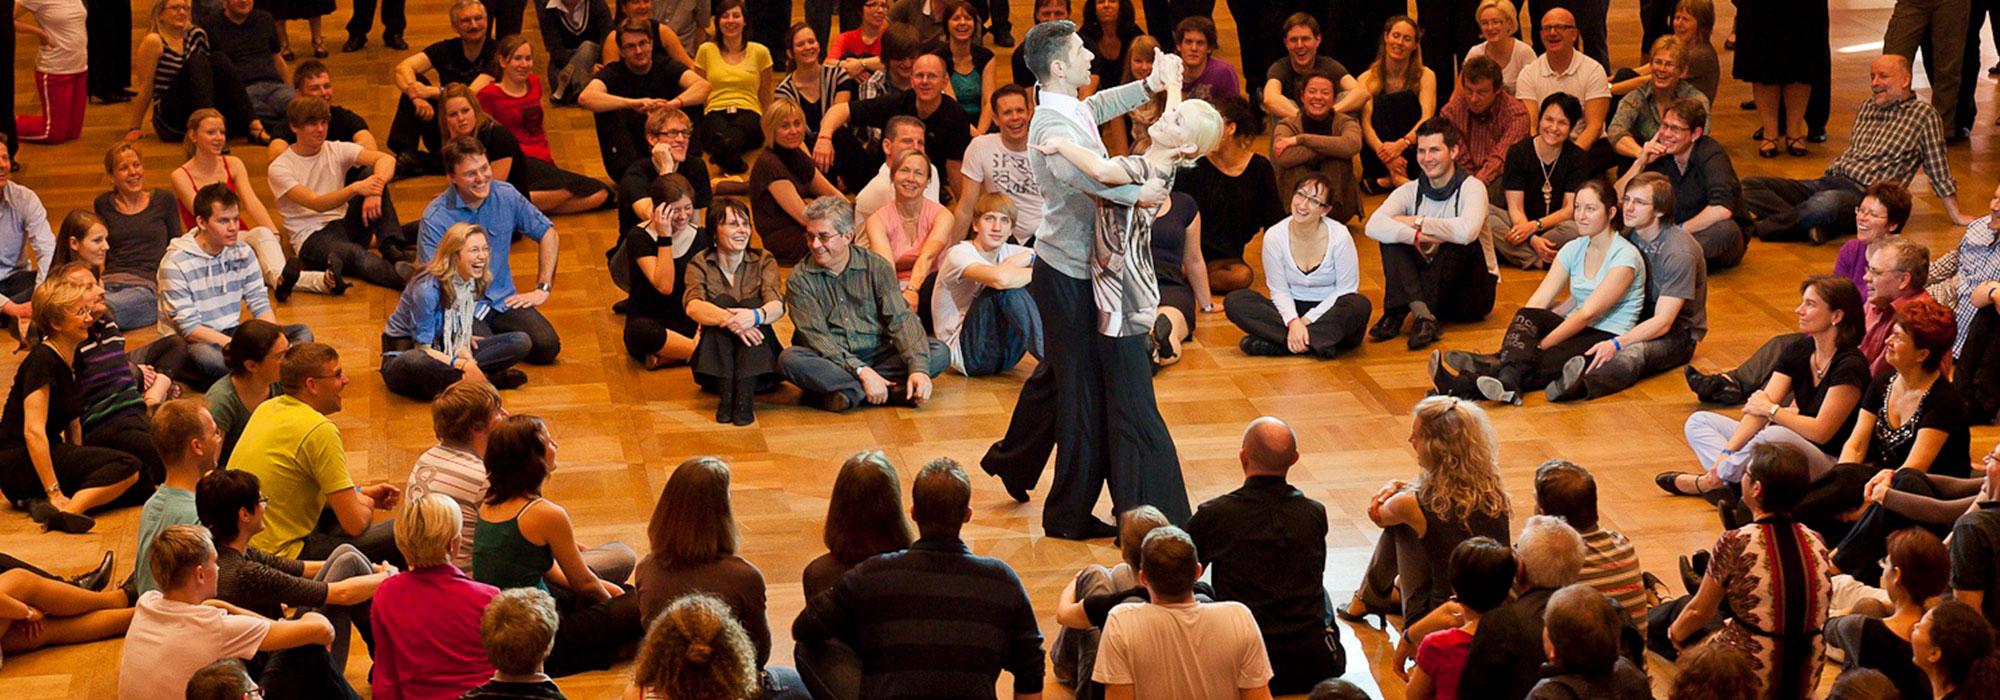 Single tanzkurs ahrensburg